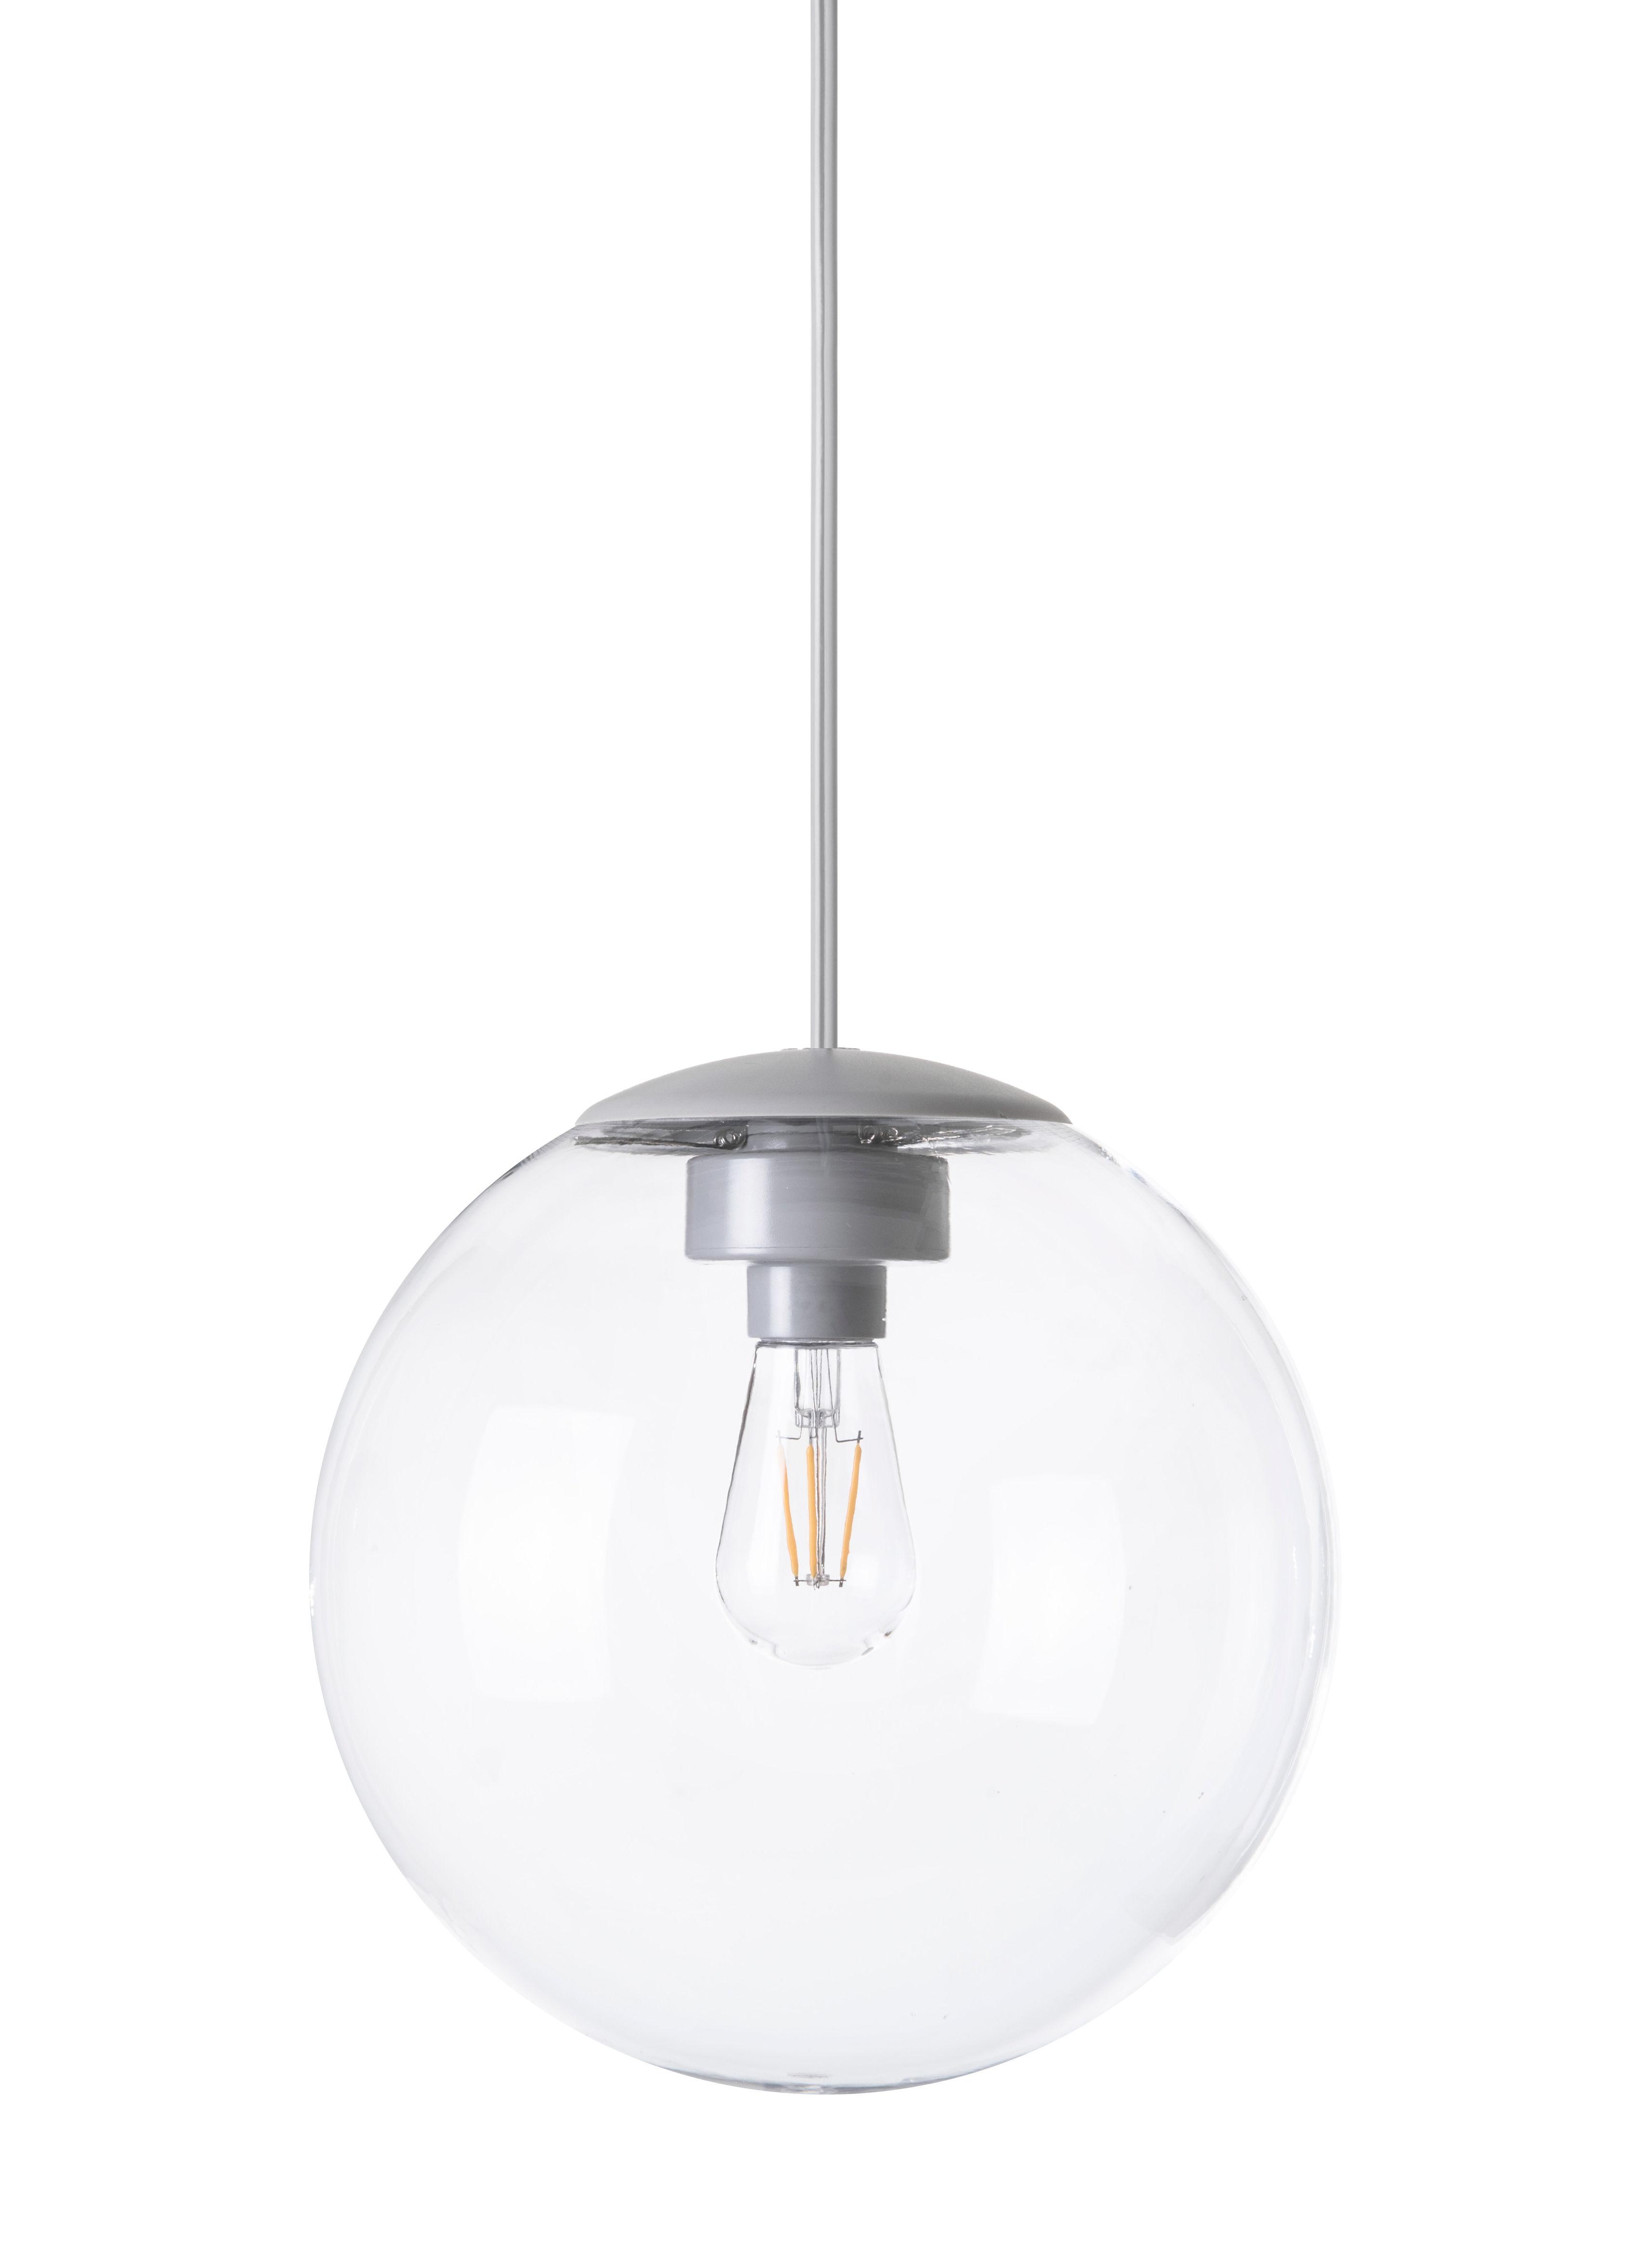 Lighting - Pendant Lighting - Spheremaker Pendant - Ø 25 cm by Fatboy - Transparent - PMMA